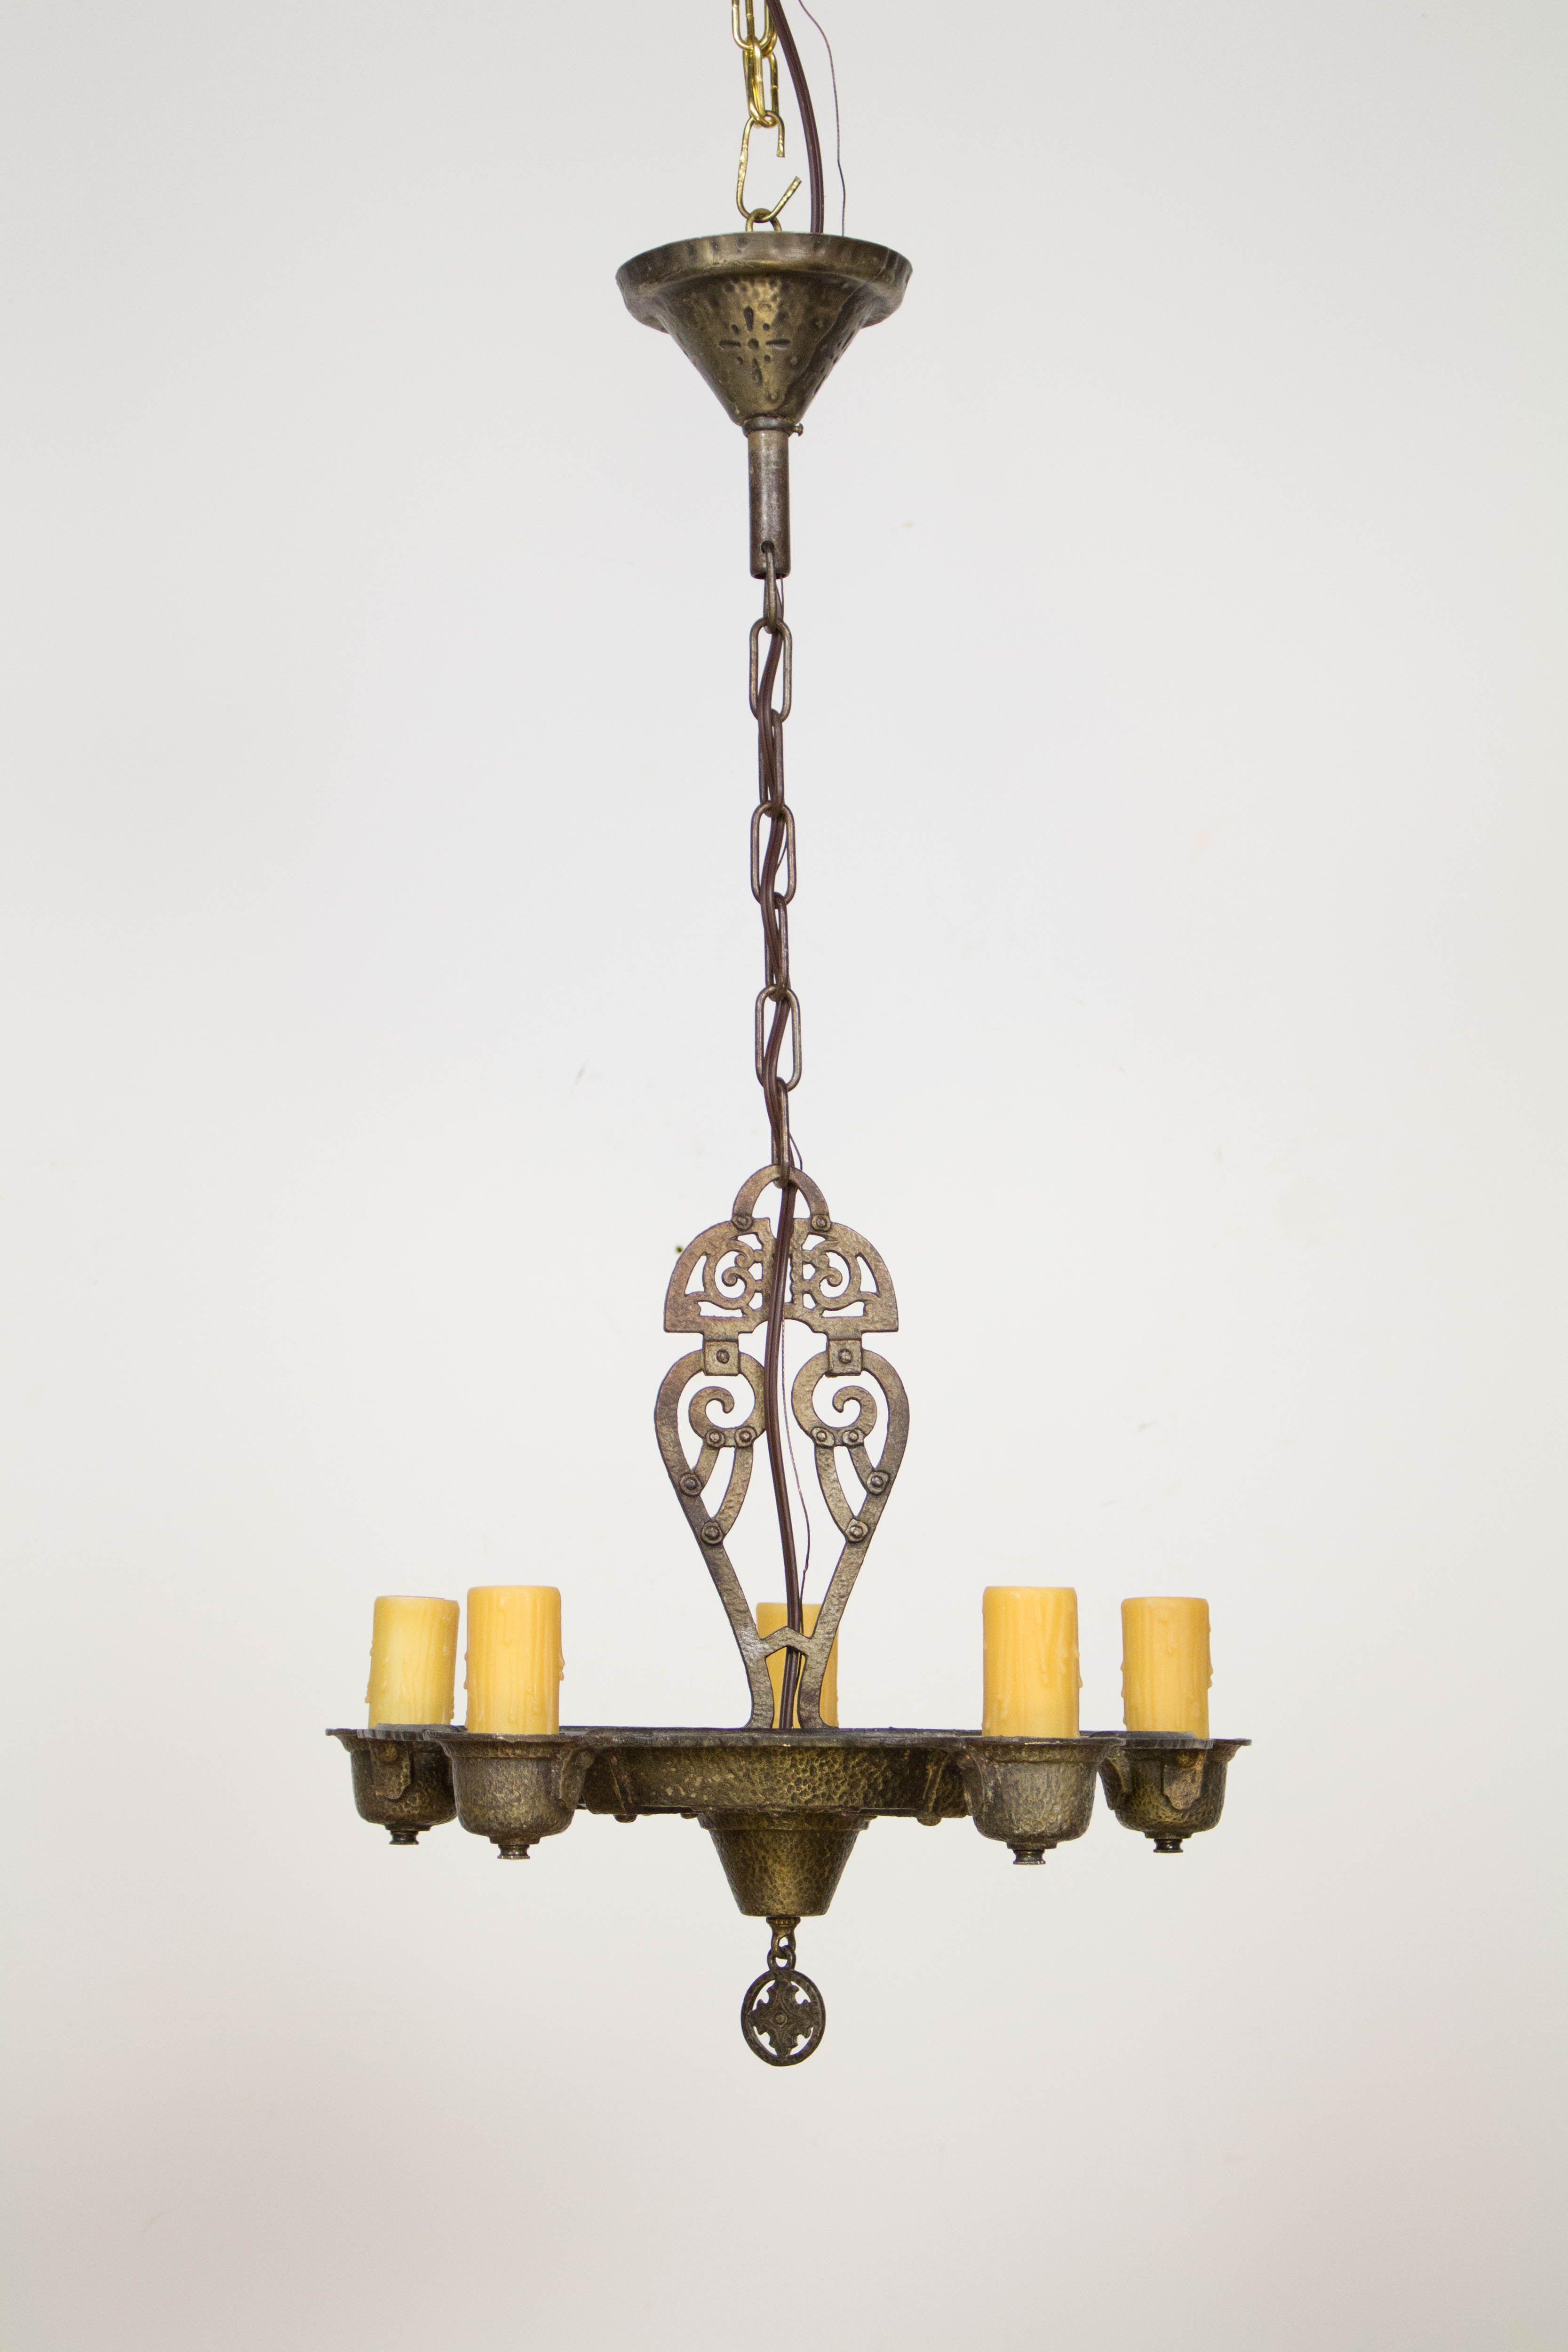 Five light tudor chandelier american c 1930 chandeliers pinterest five light tudor chandelier american c 1930 aloadofball Choice Image